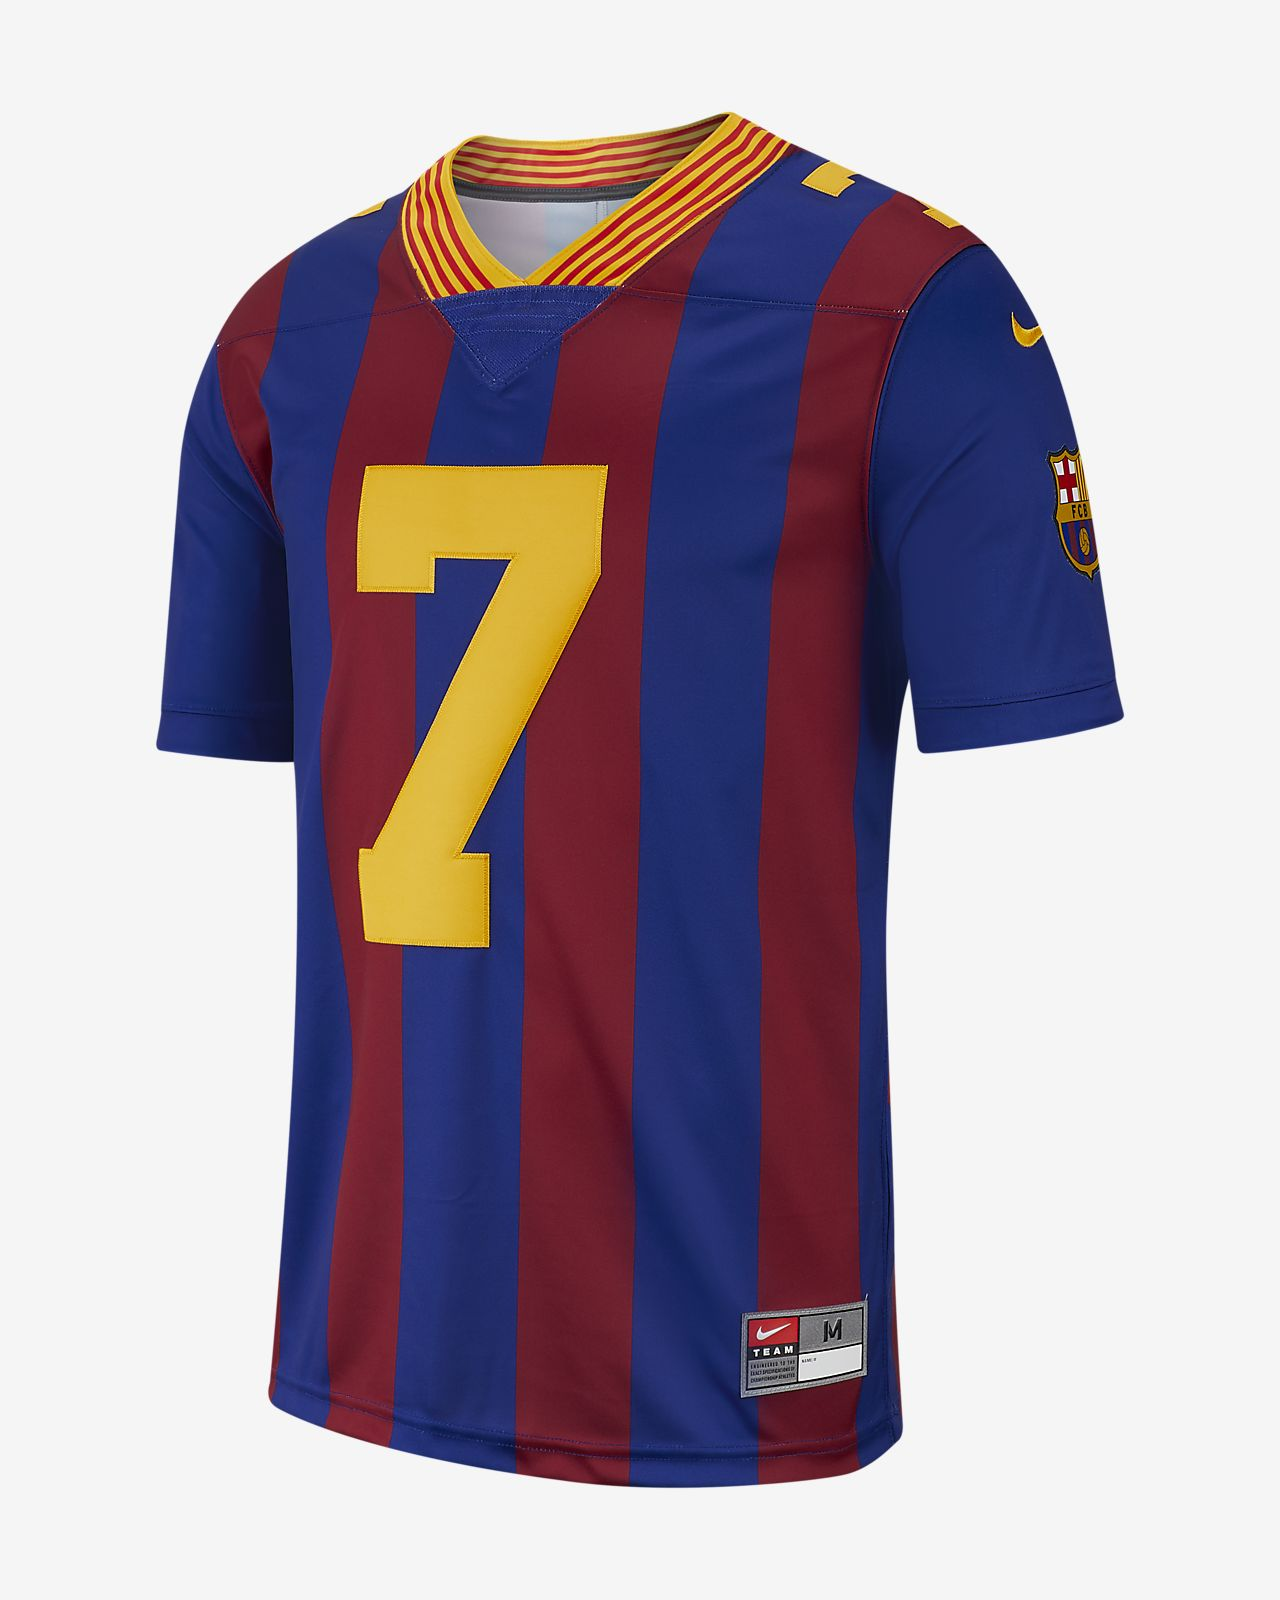 FC Barcelona Limited Jersey Men's Football Jersey